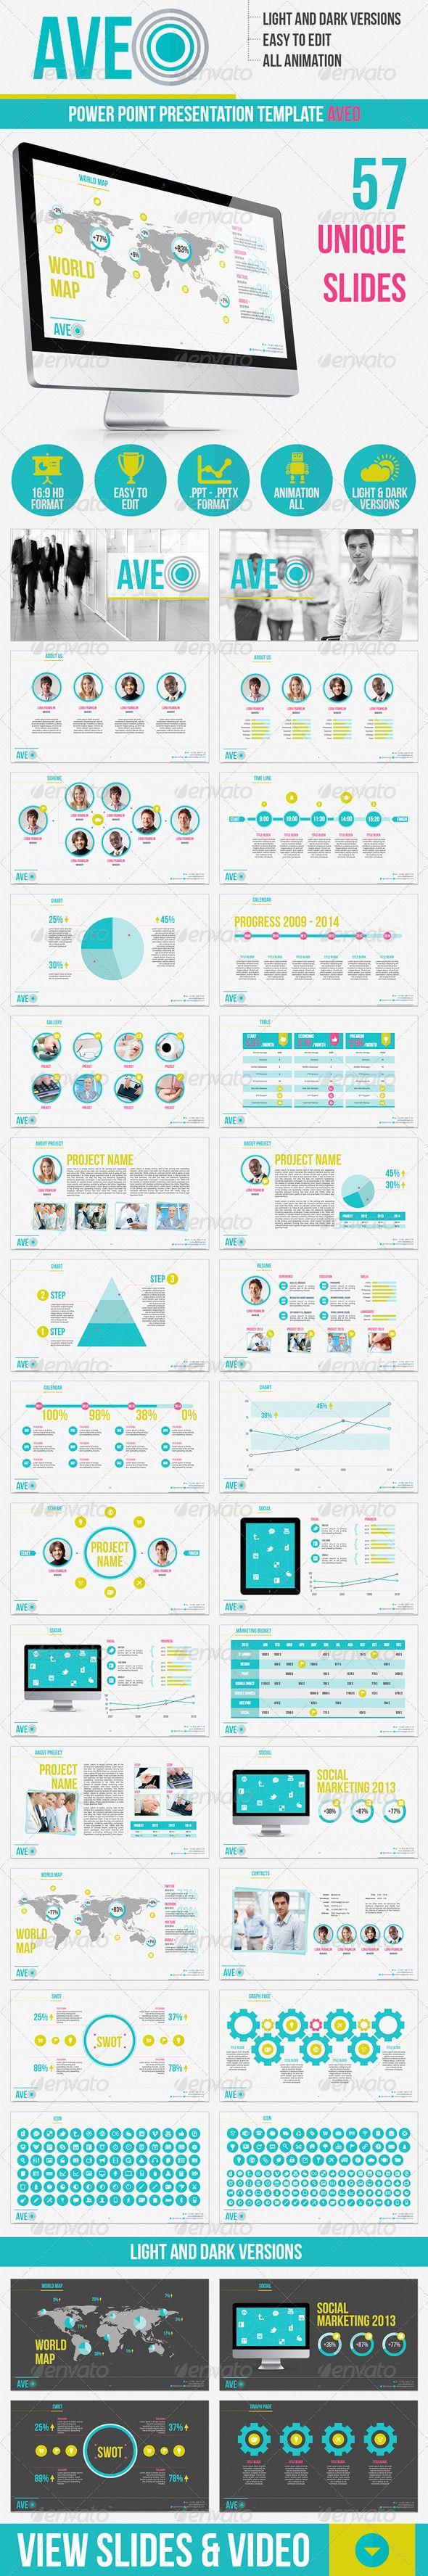 AVEO - Creative Powerpoint Templates